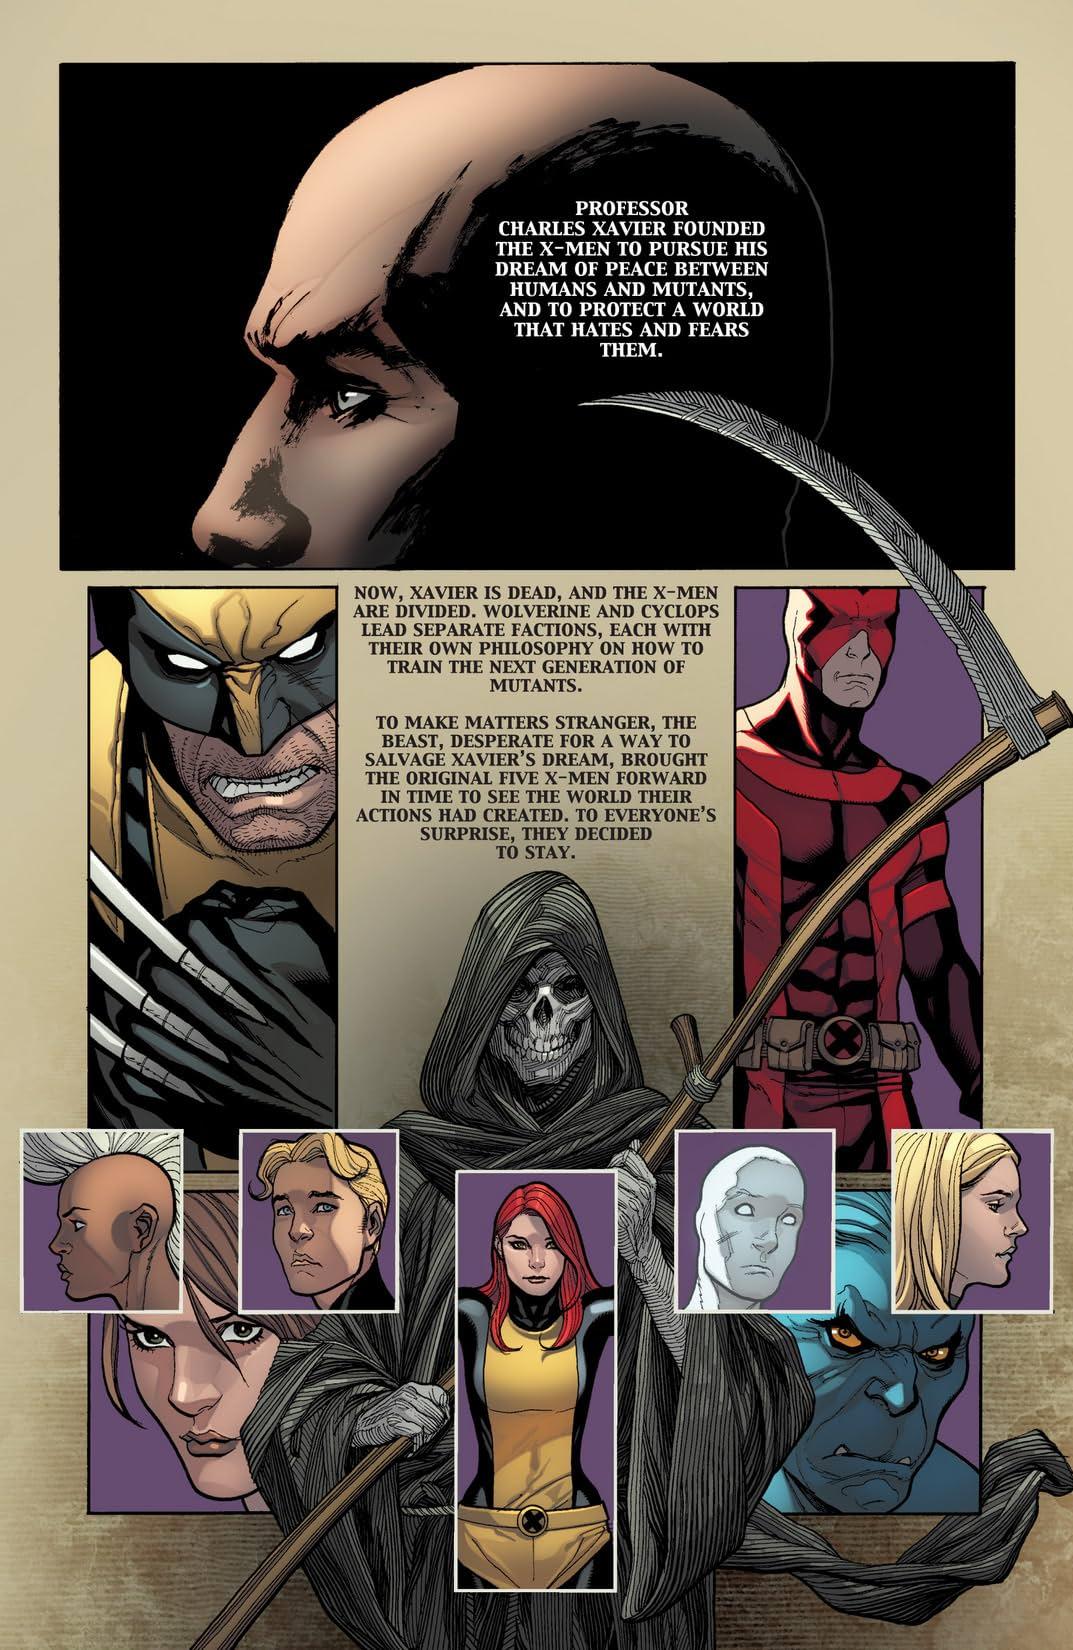 X-Men: Battle of the Atom #1 (of 2)